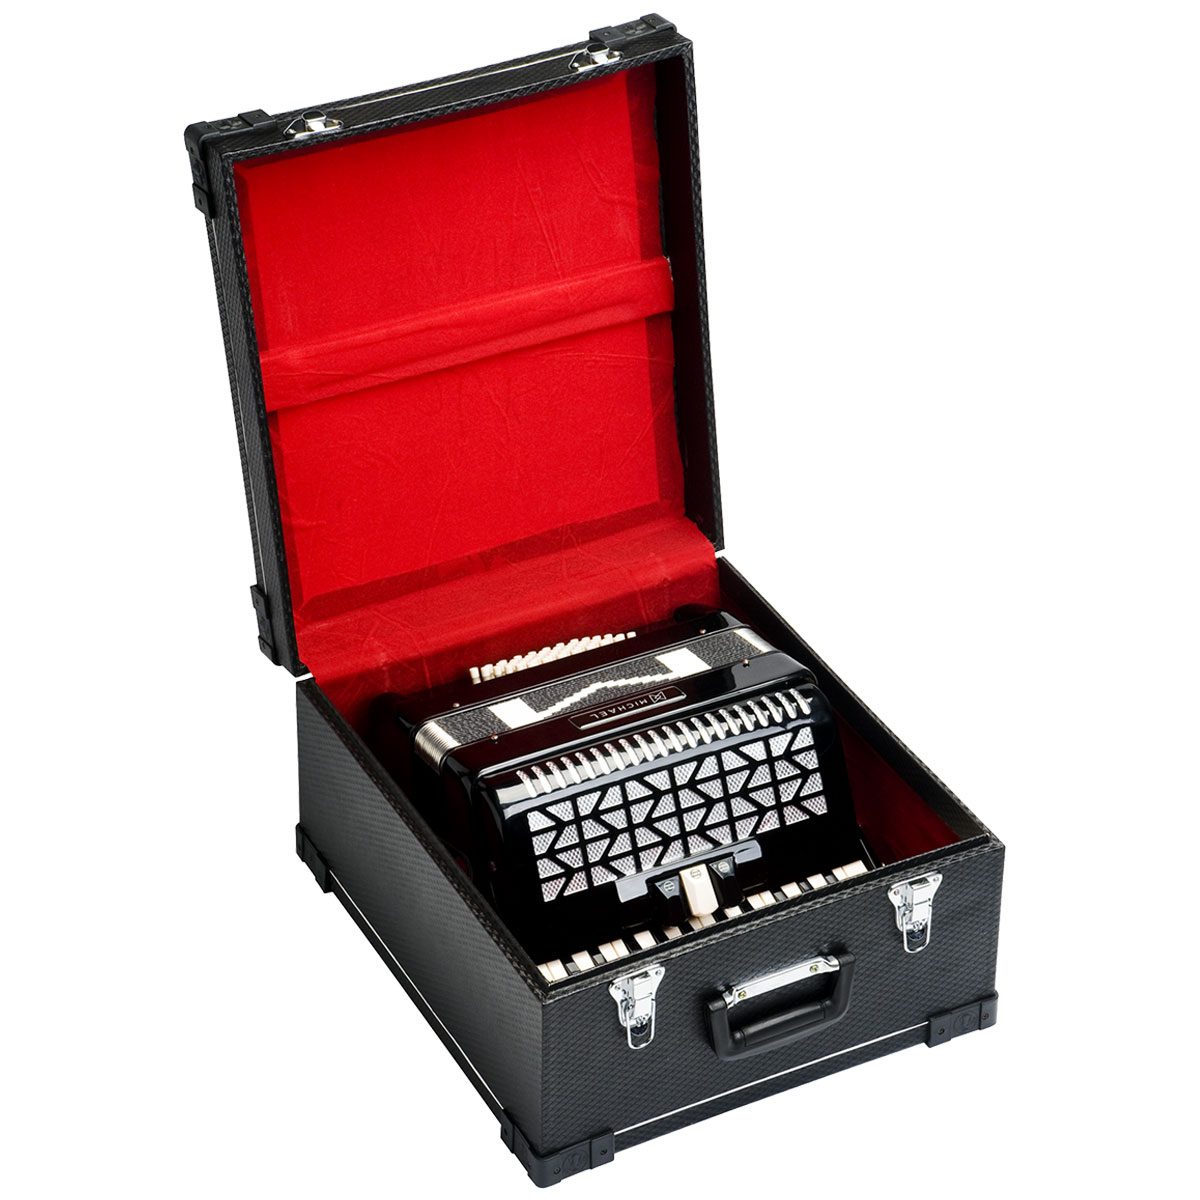 Acordeon de 48 Baixos - ACM 4803 N SPB Michael